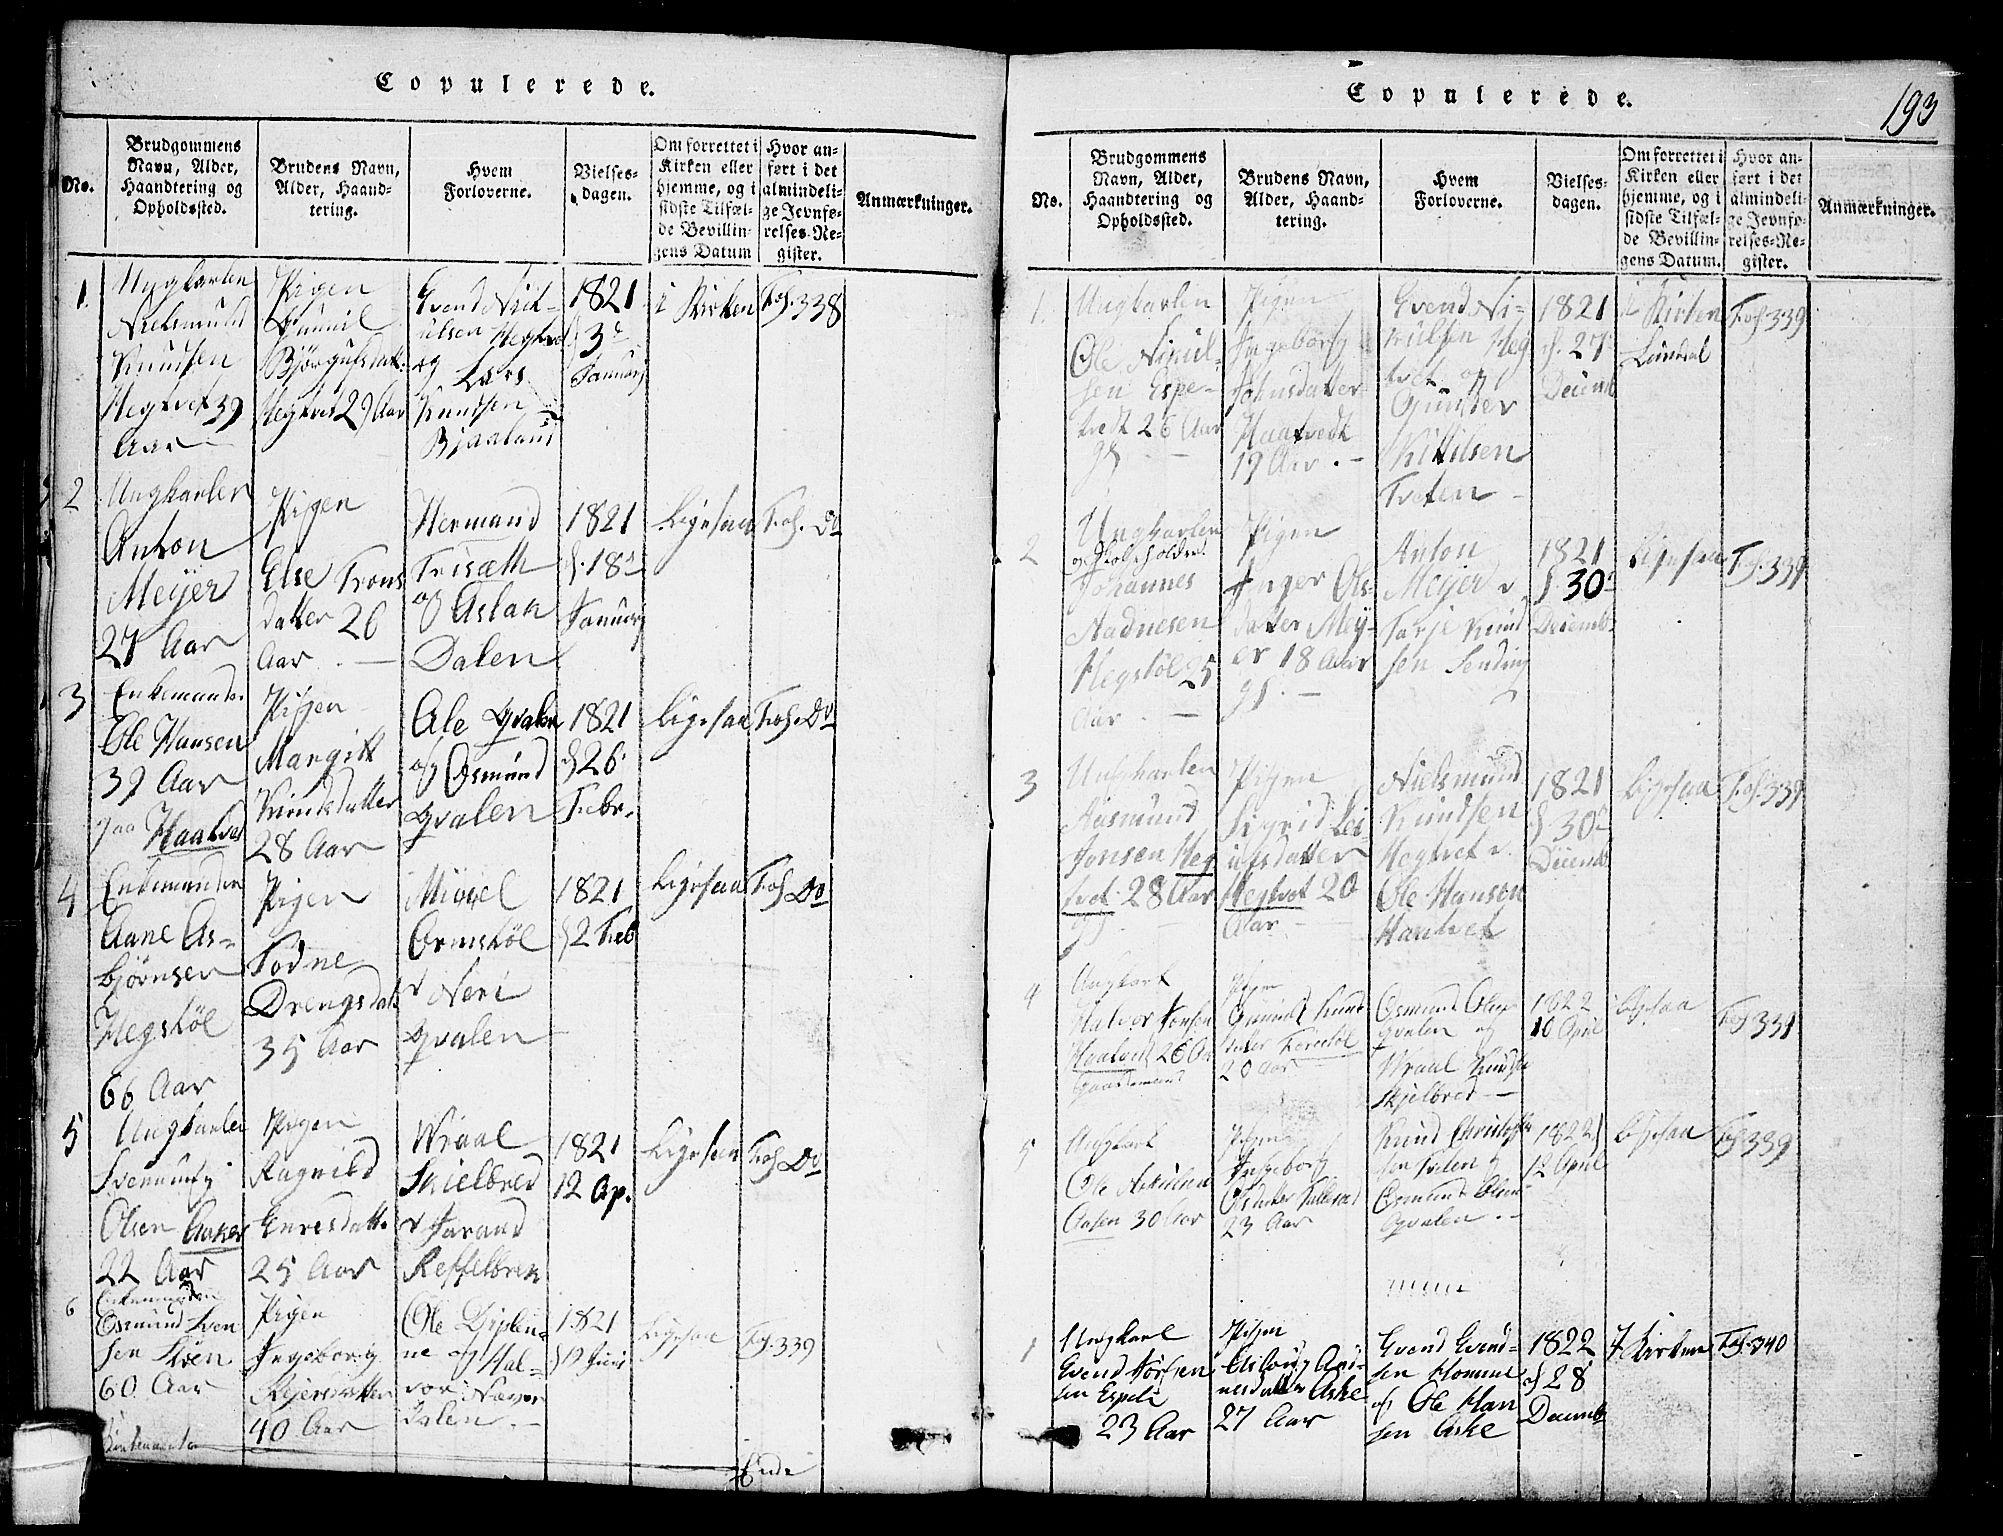 SAKO, Lårdal kirkebøker, G/Ga/L0001: Klokkerbok nr. I 1, 1815-1861, s. 193